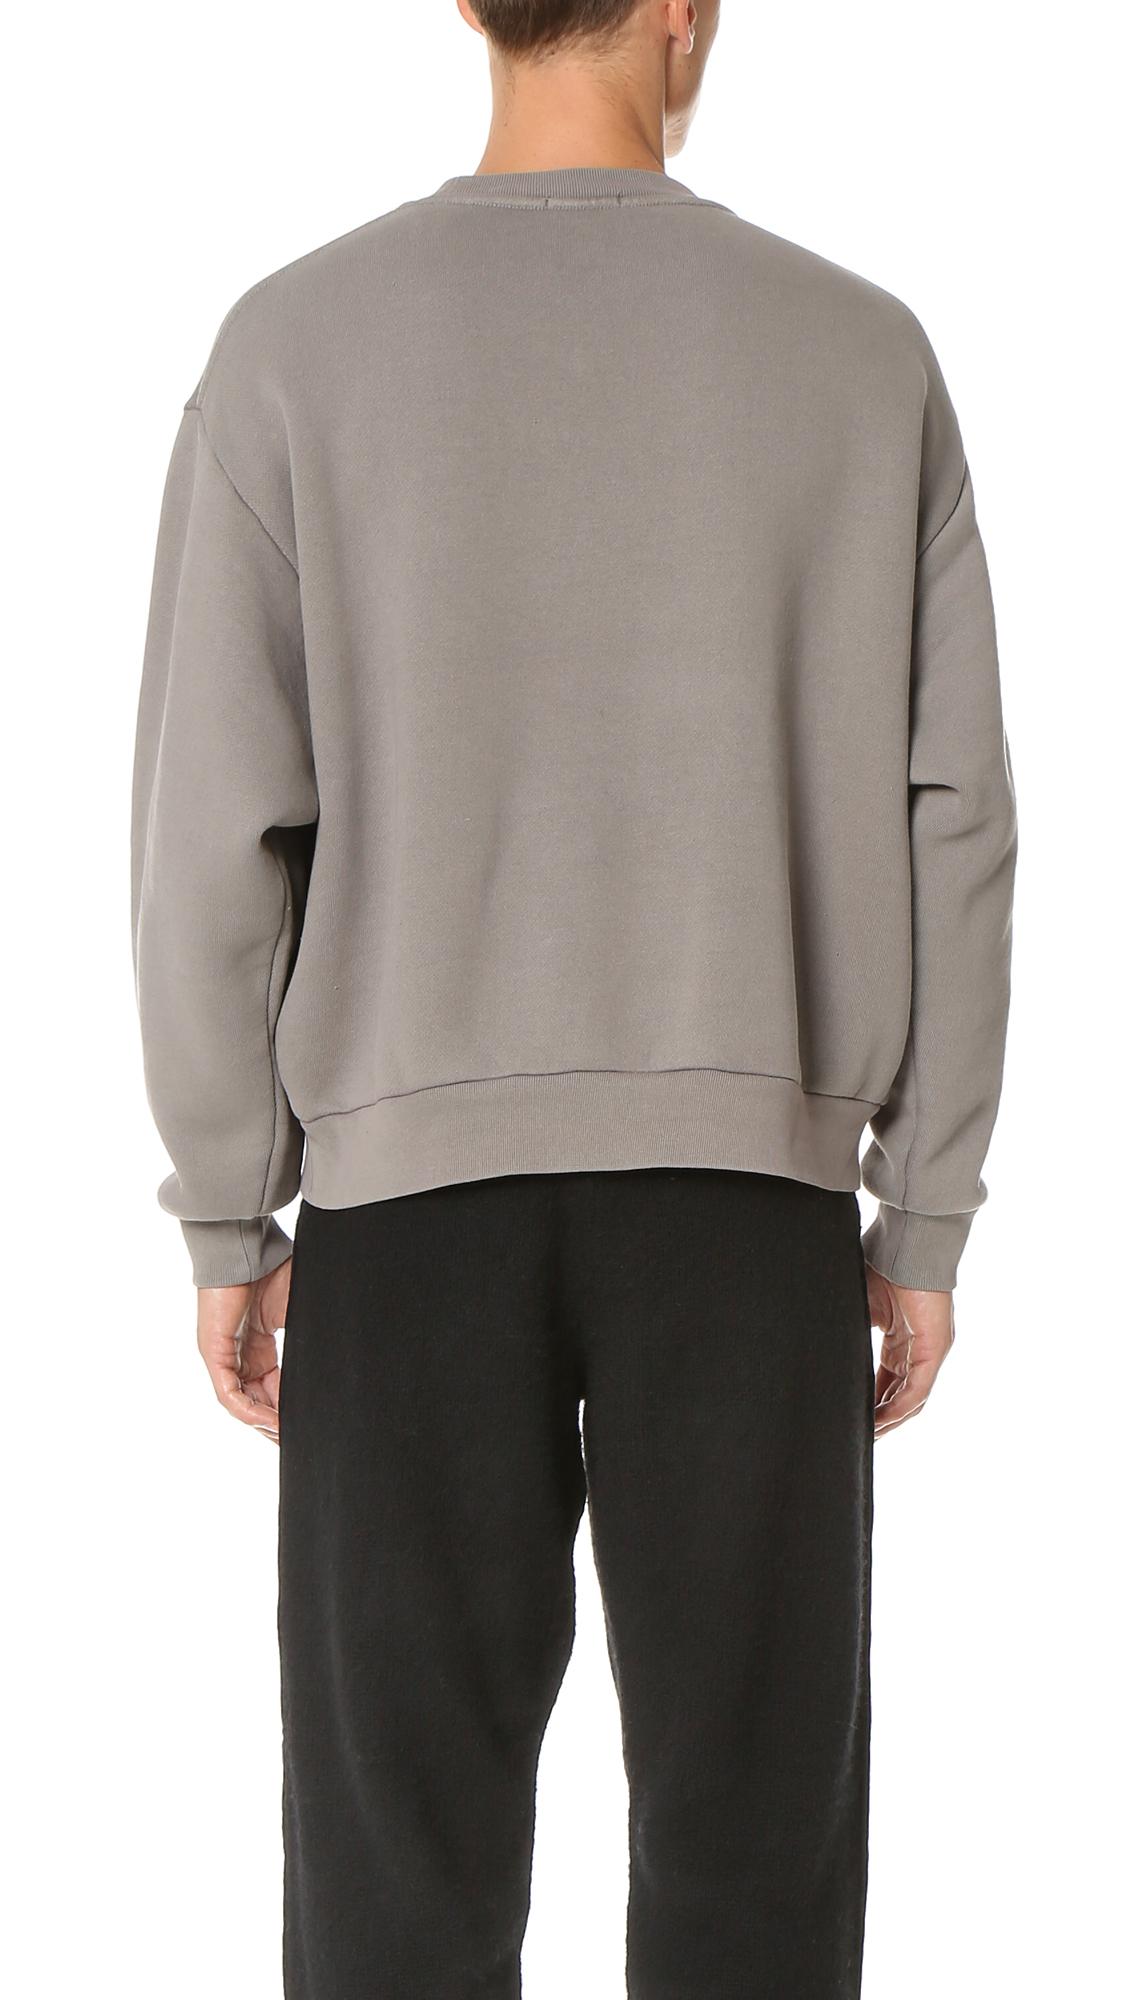 T By Alexander Wang Fleece Oversized Crew Neck Sweatshirt in Slate (Grey) for Men